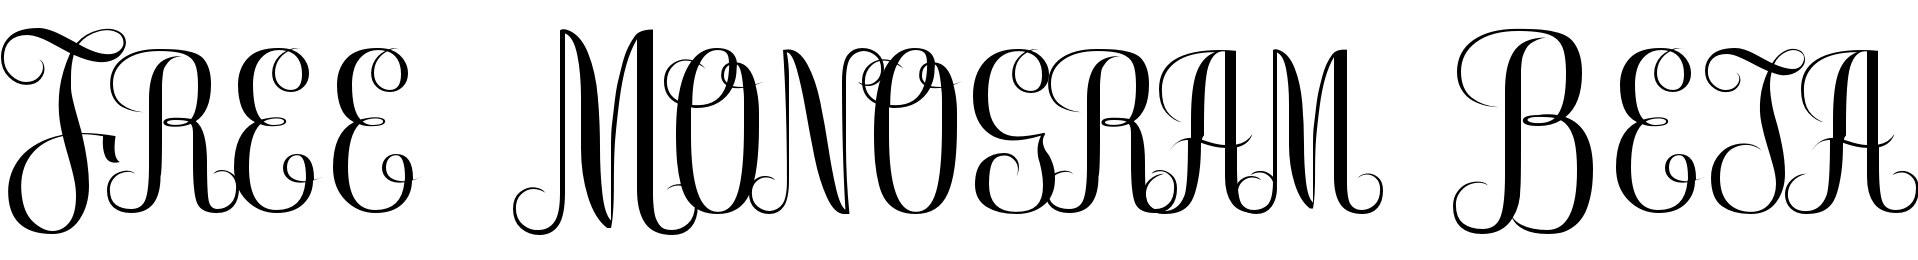 Free Monogram Beta